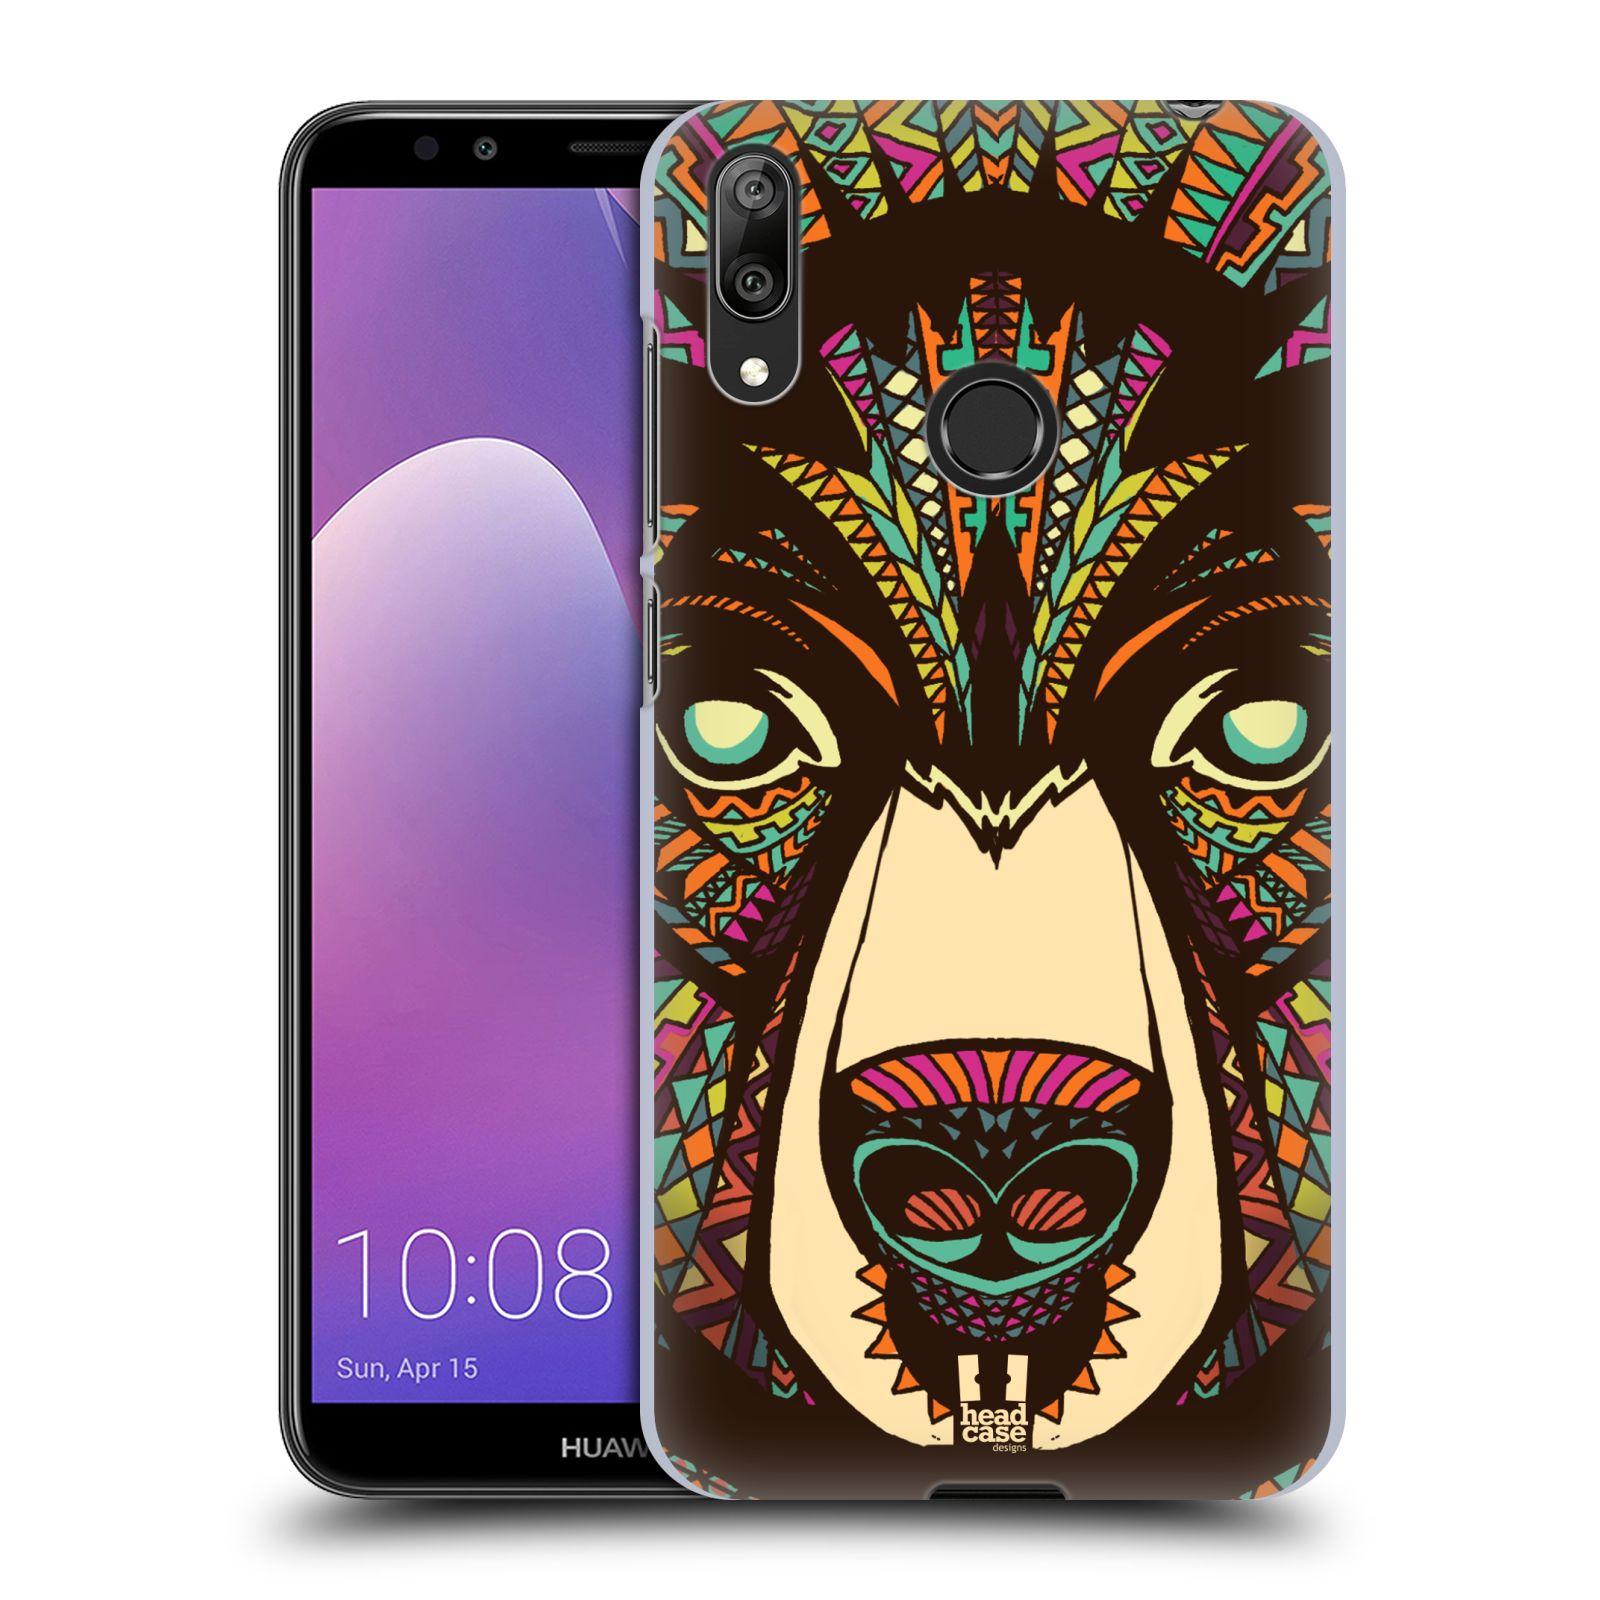 Plastové pouzdro na mobil Huawei Y7 (2019) - Head Case - AZTEC MEDVĚD